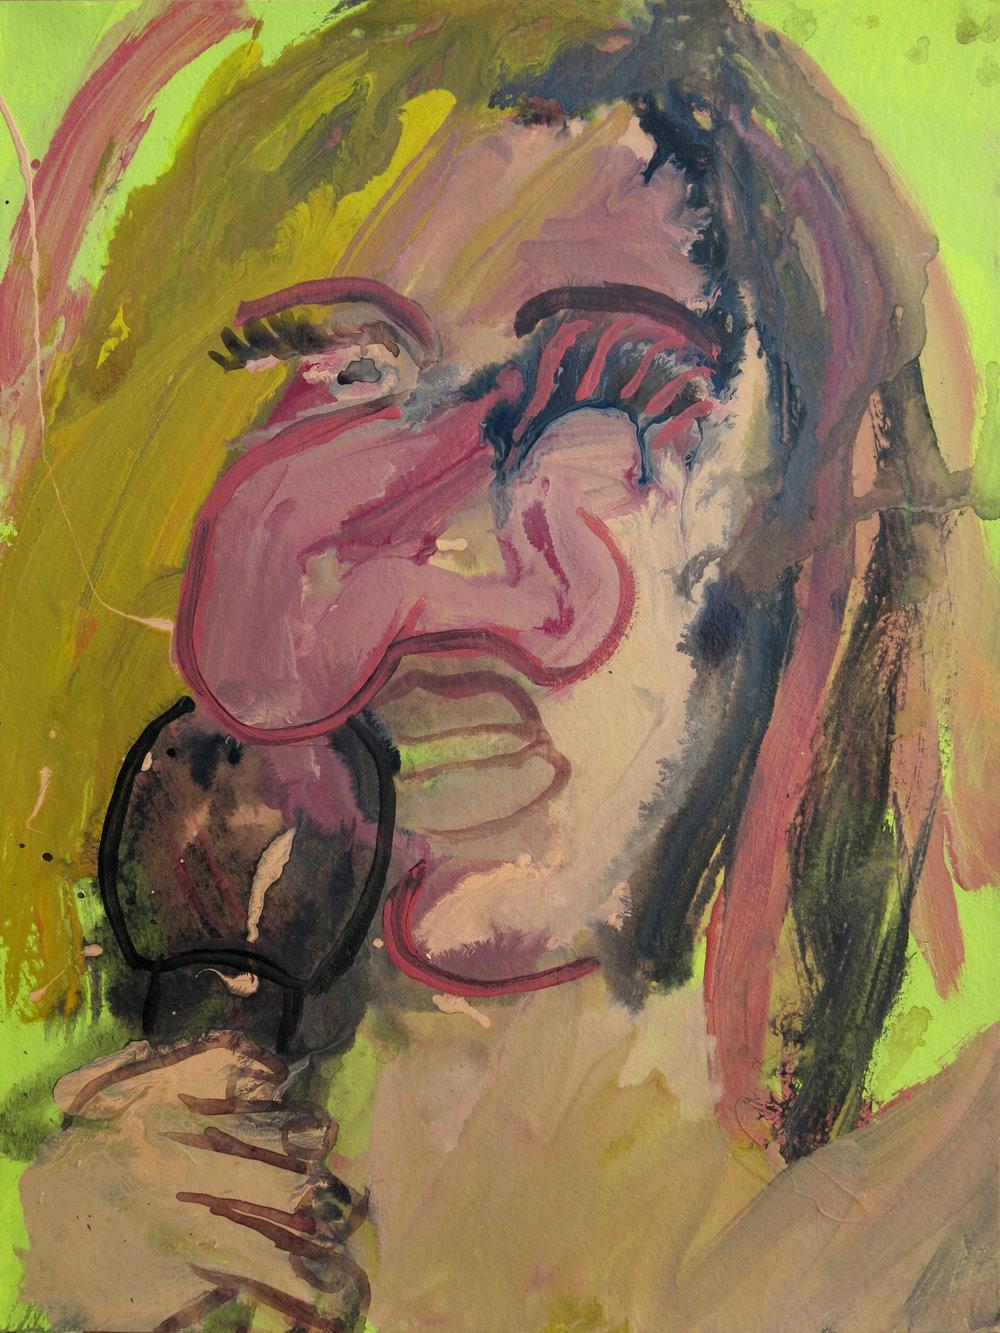 Barbra Streisand Portrait #2